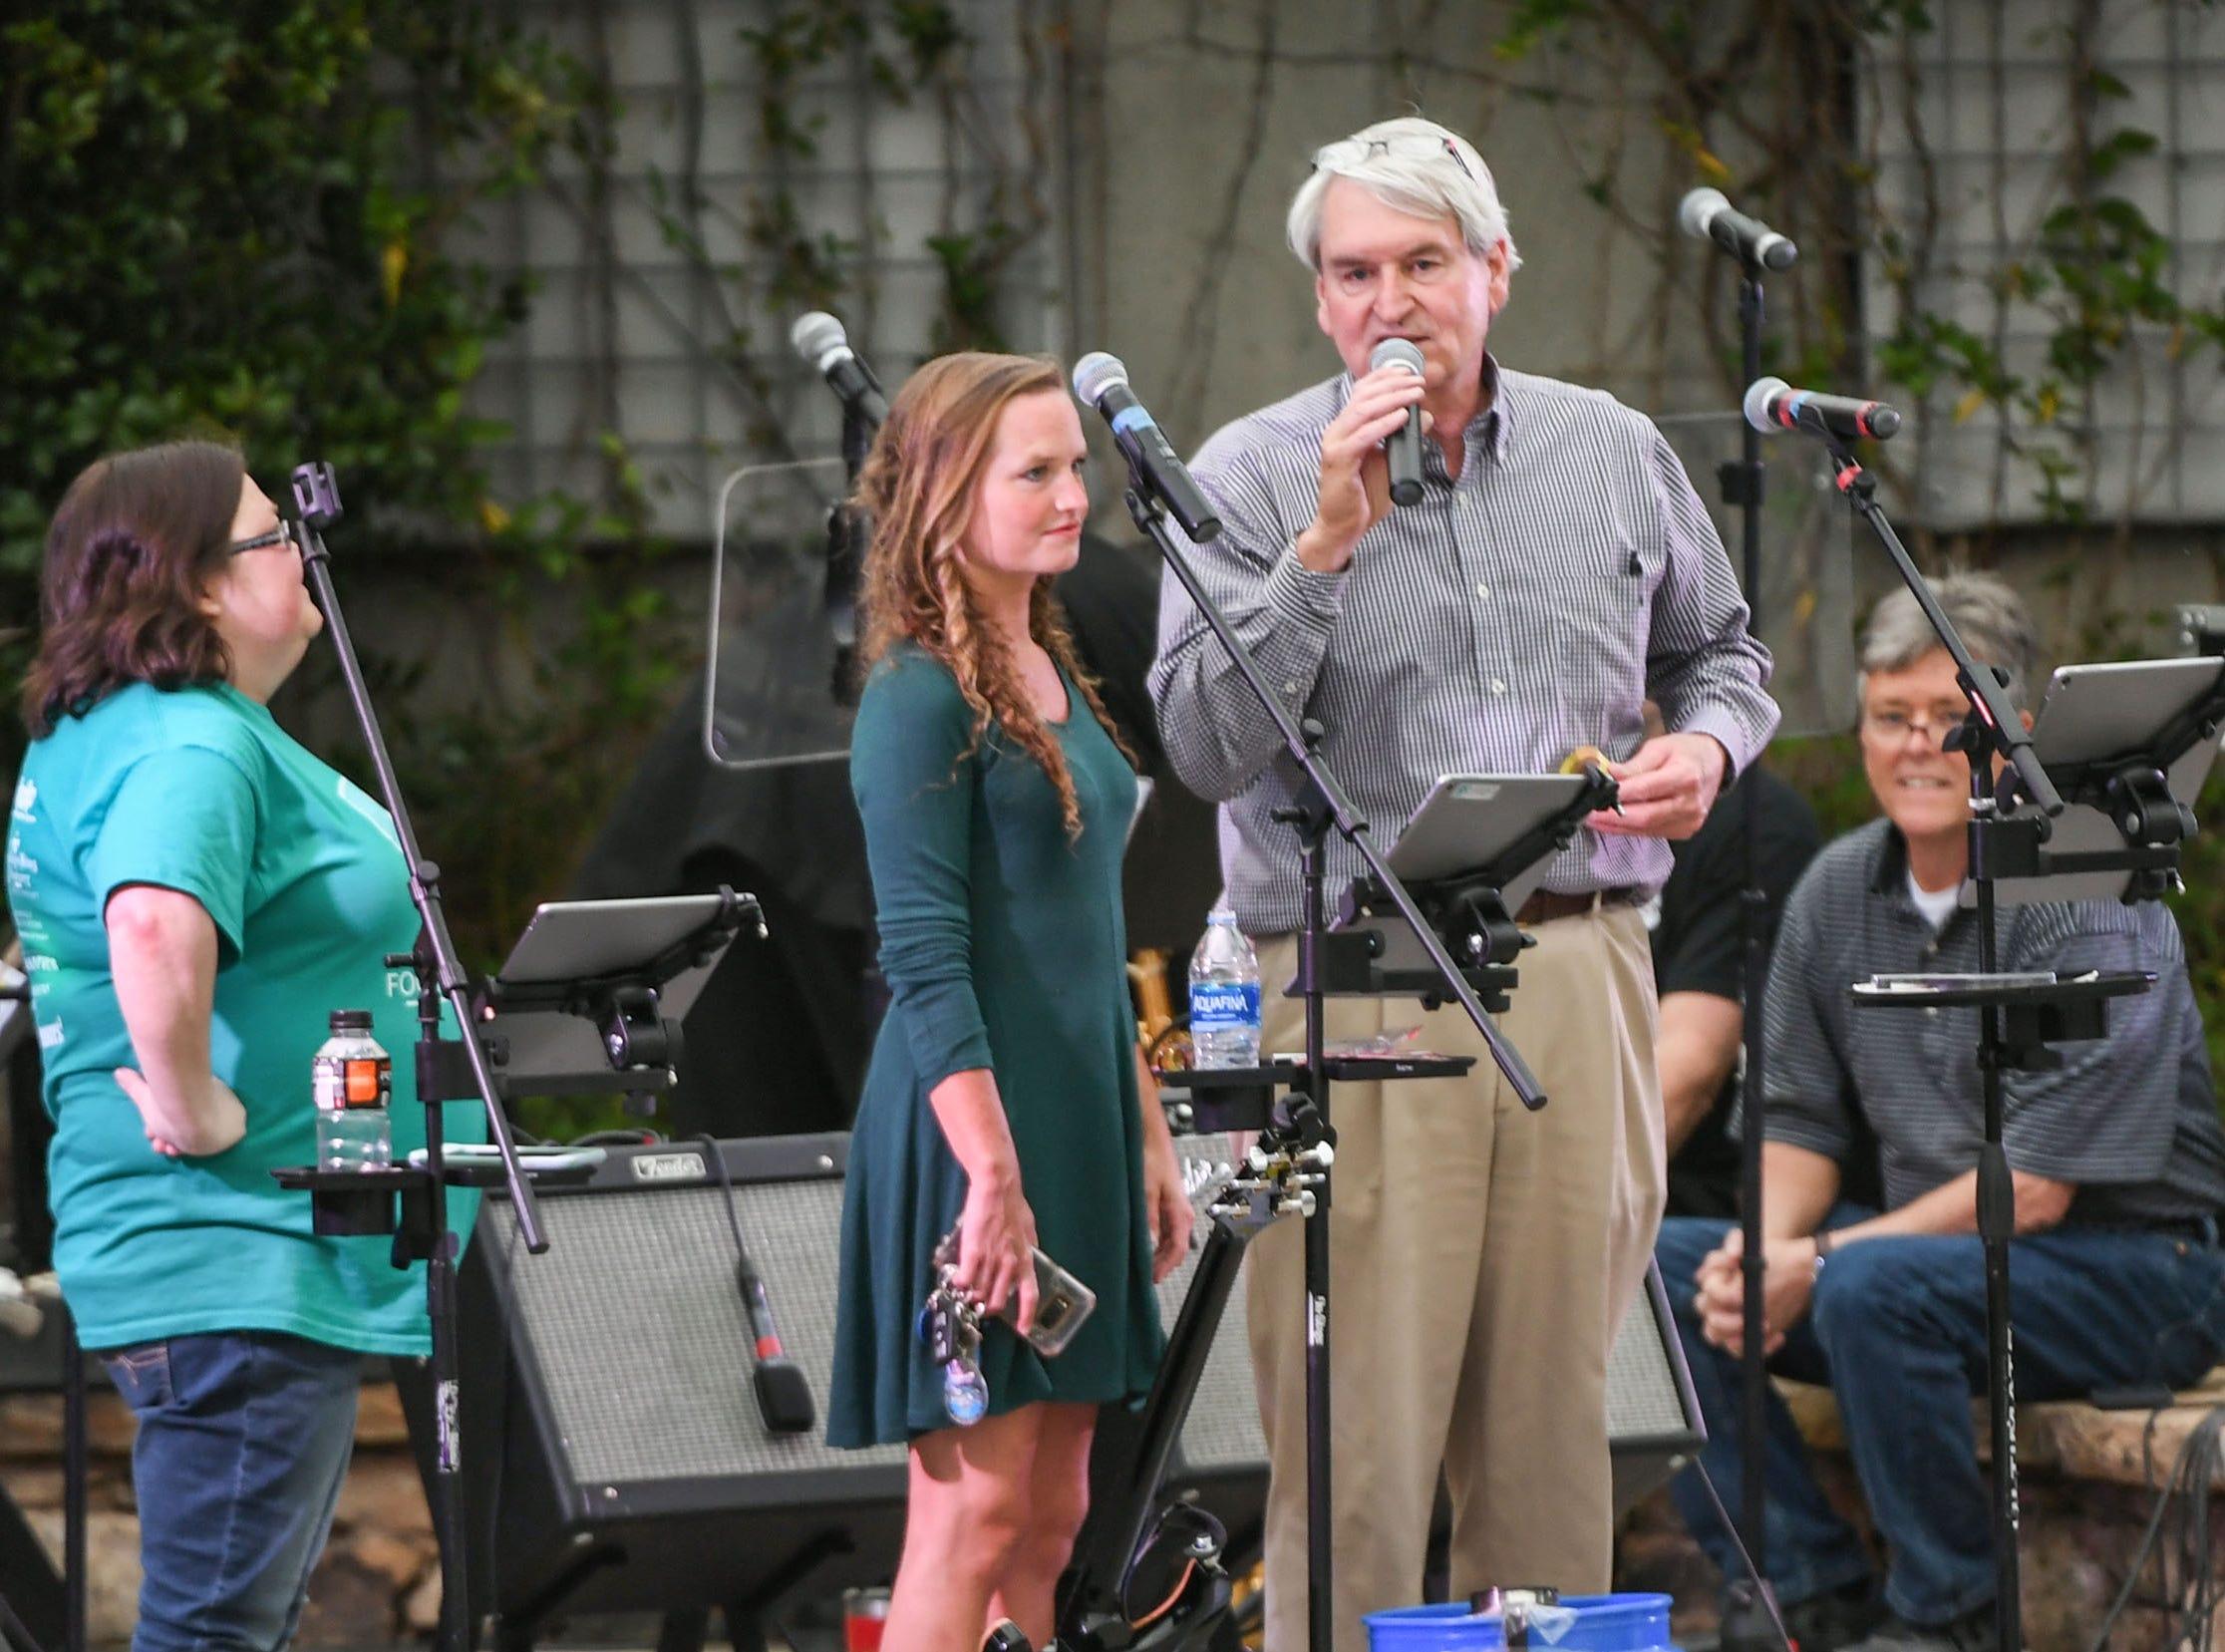 Carey Jones, Jr. speaks during the Main Street Program Block Party at Carolina Wren Park in downtown Anderson Thursday.